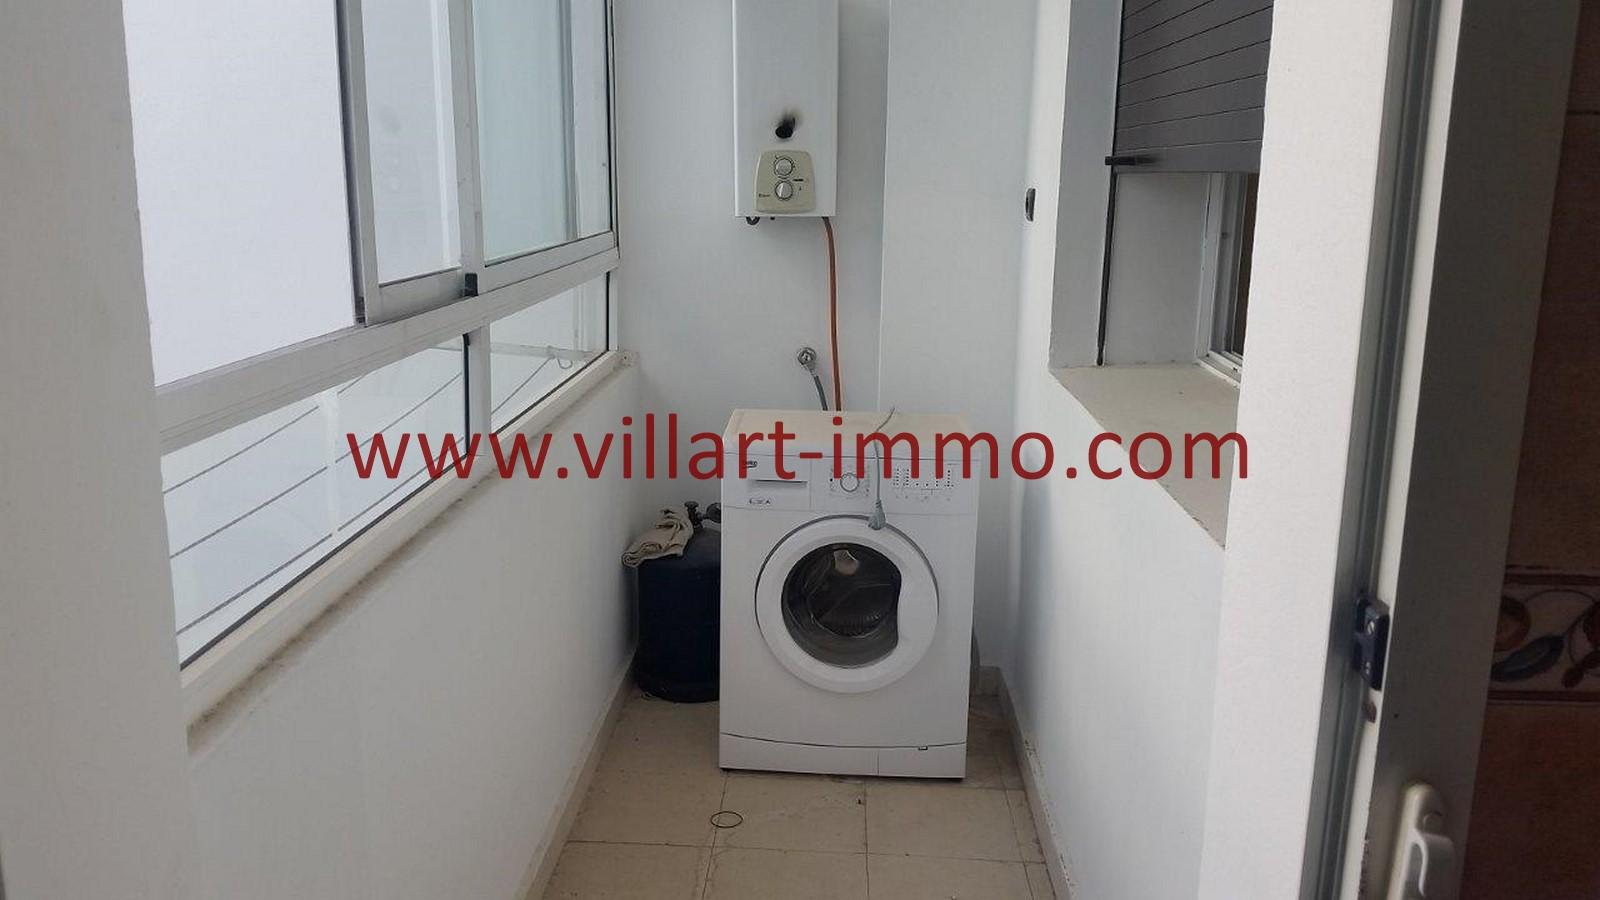 4-location-appartement-meubles-tanger-iberia-buanderie-l1012-villart-immo-maroc